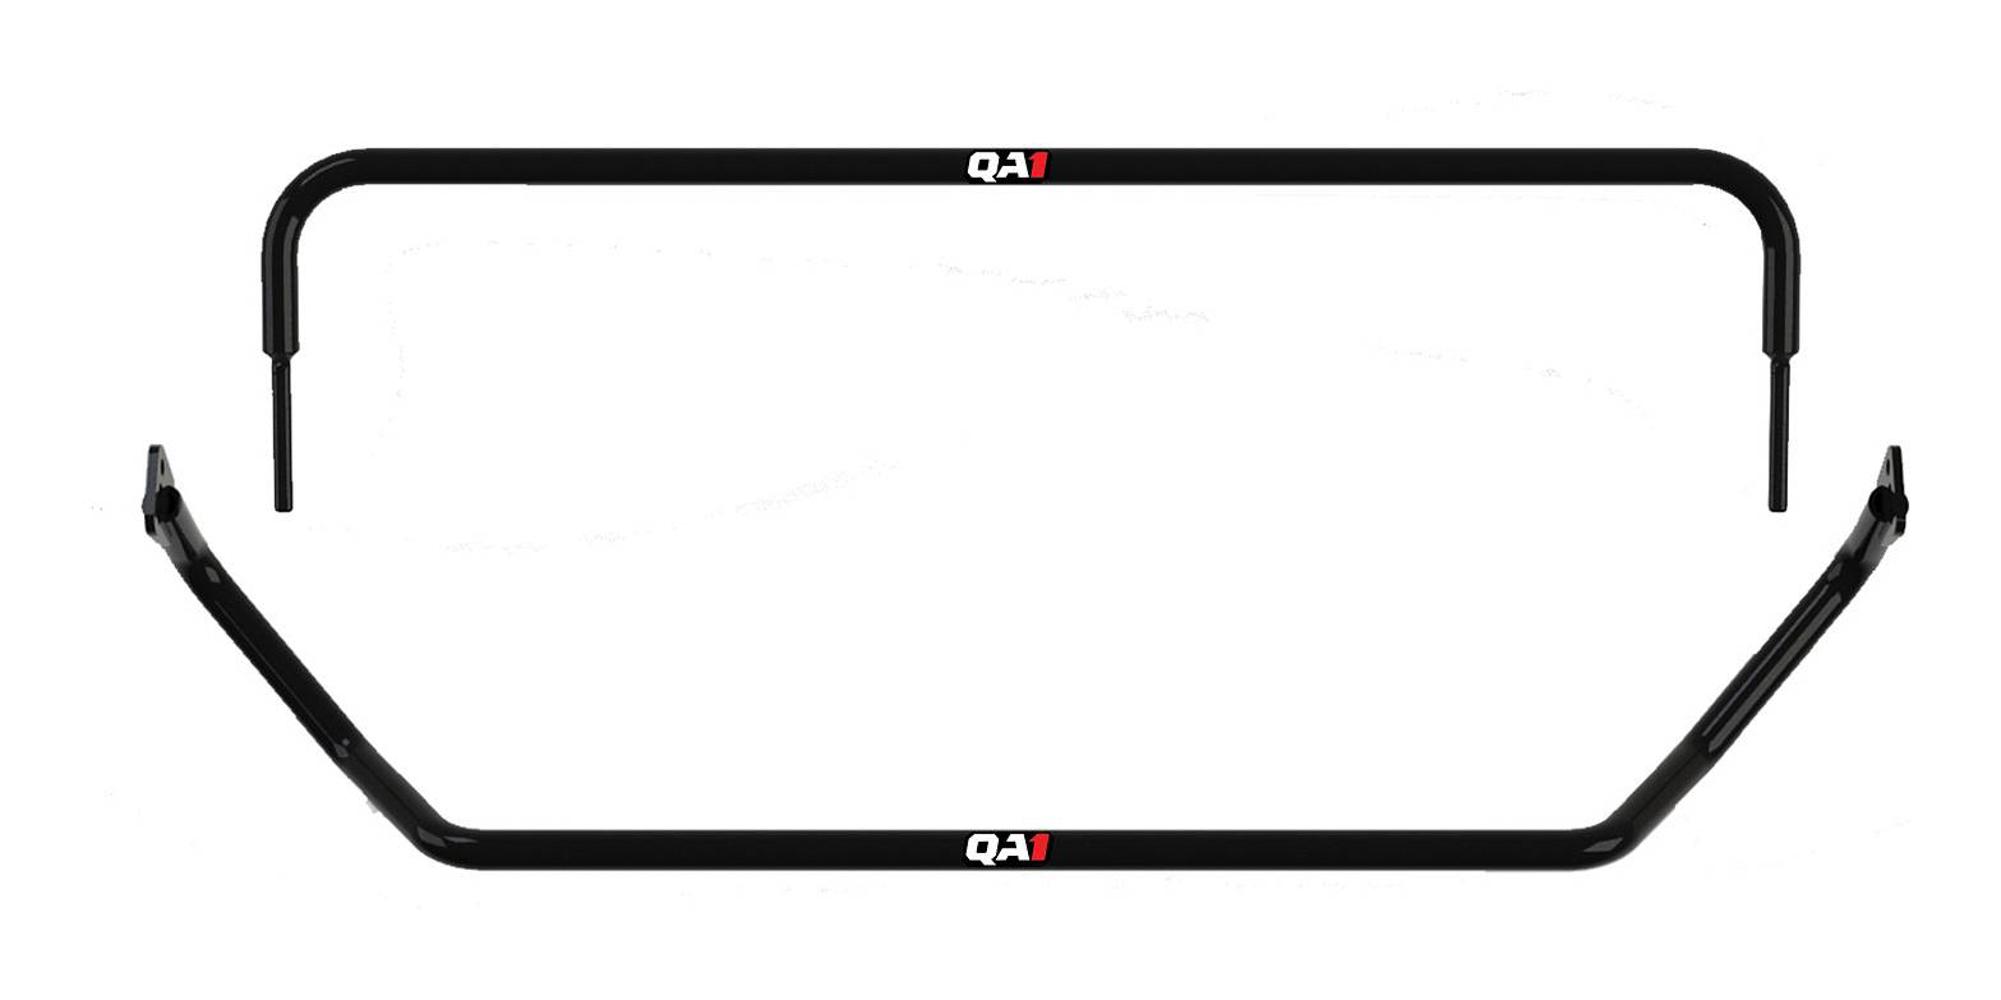 Qa1 Sway Bar Set - F & R 2010 -Present Camaro